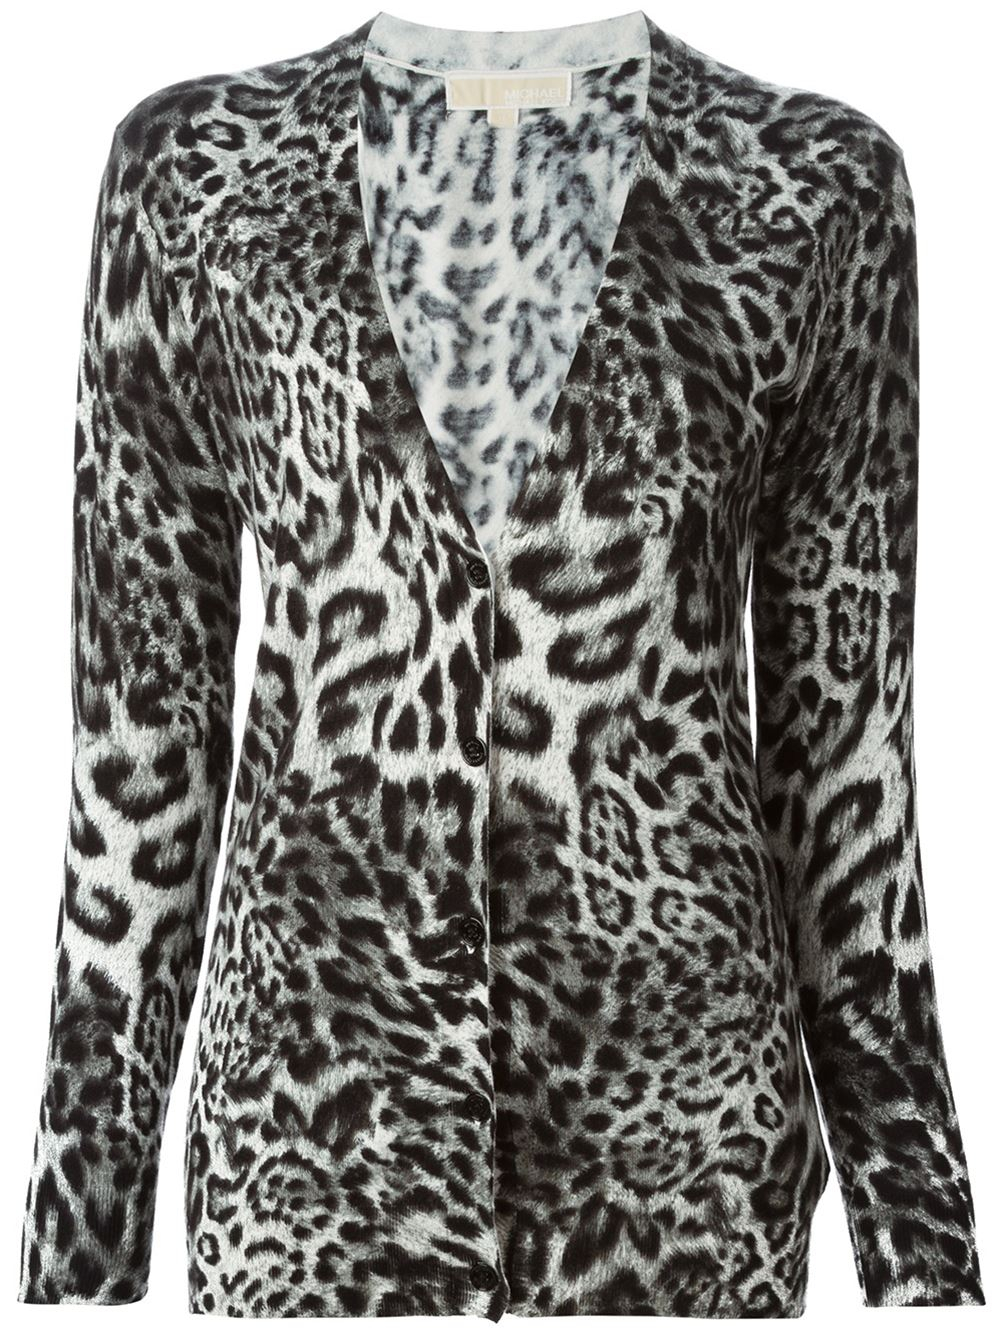 Michael michael kors Leopard Print Cardigan in Animal ... - photo#33